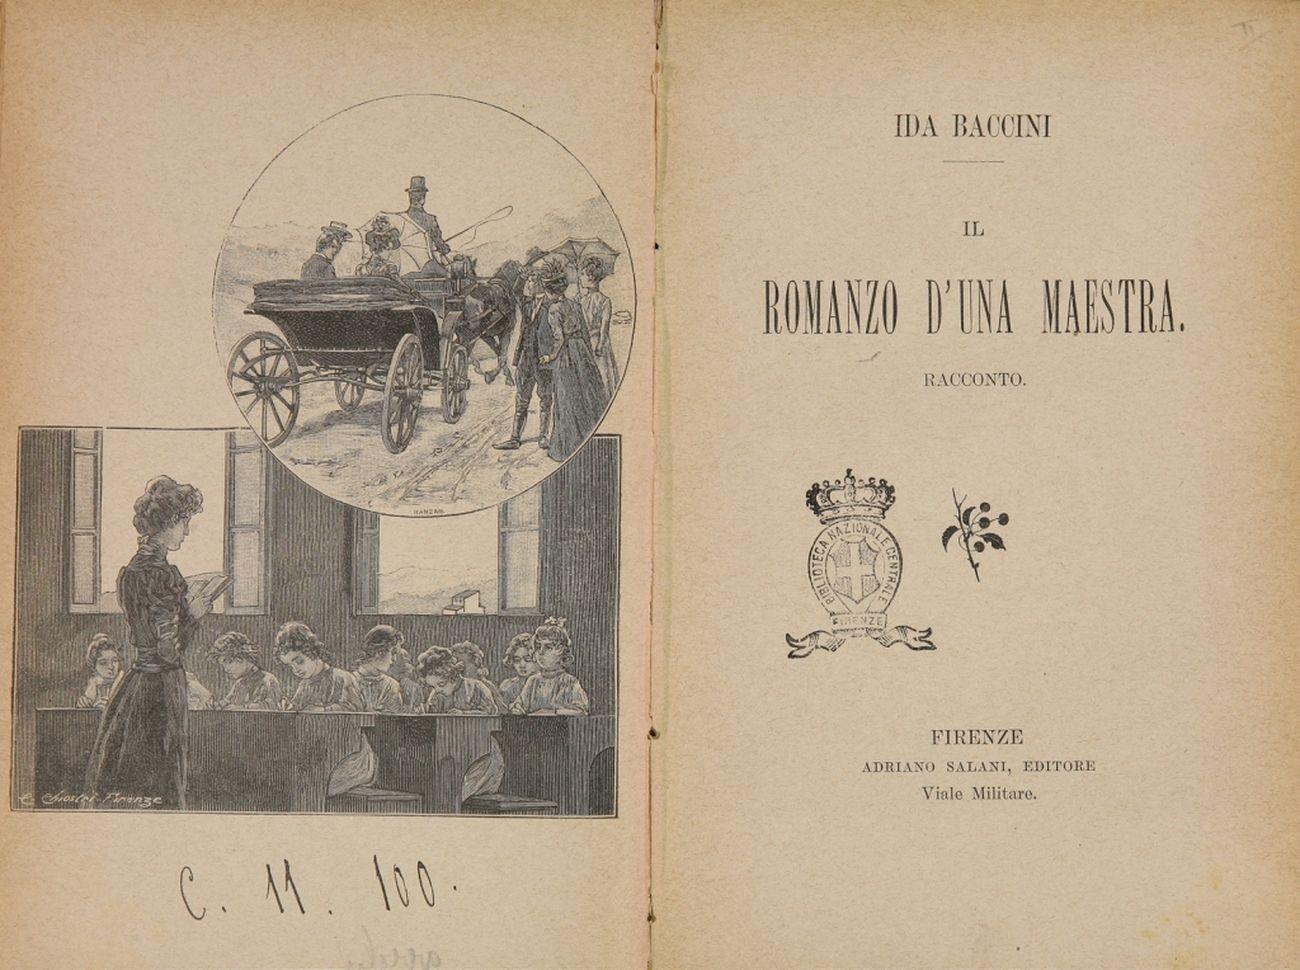 Ida Baccini, Il romanzo d'una maestra, 1901. Biblioteca Nazionale Centrale,  Firenze | Artribune